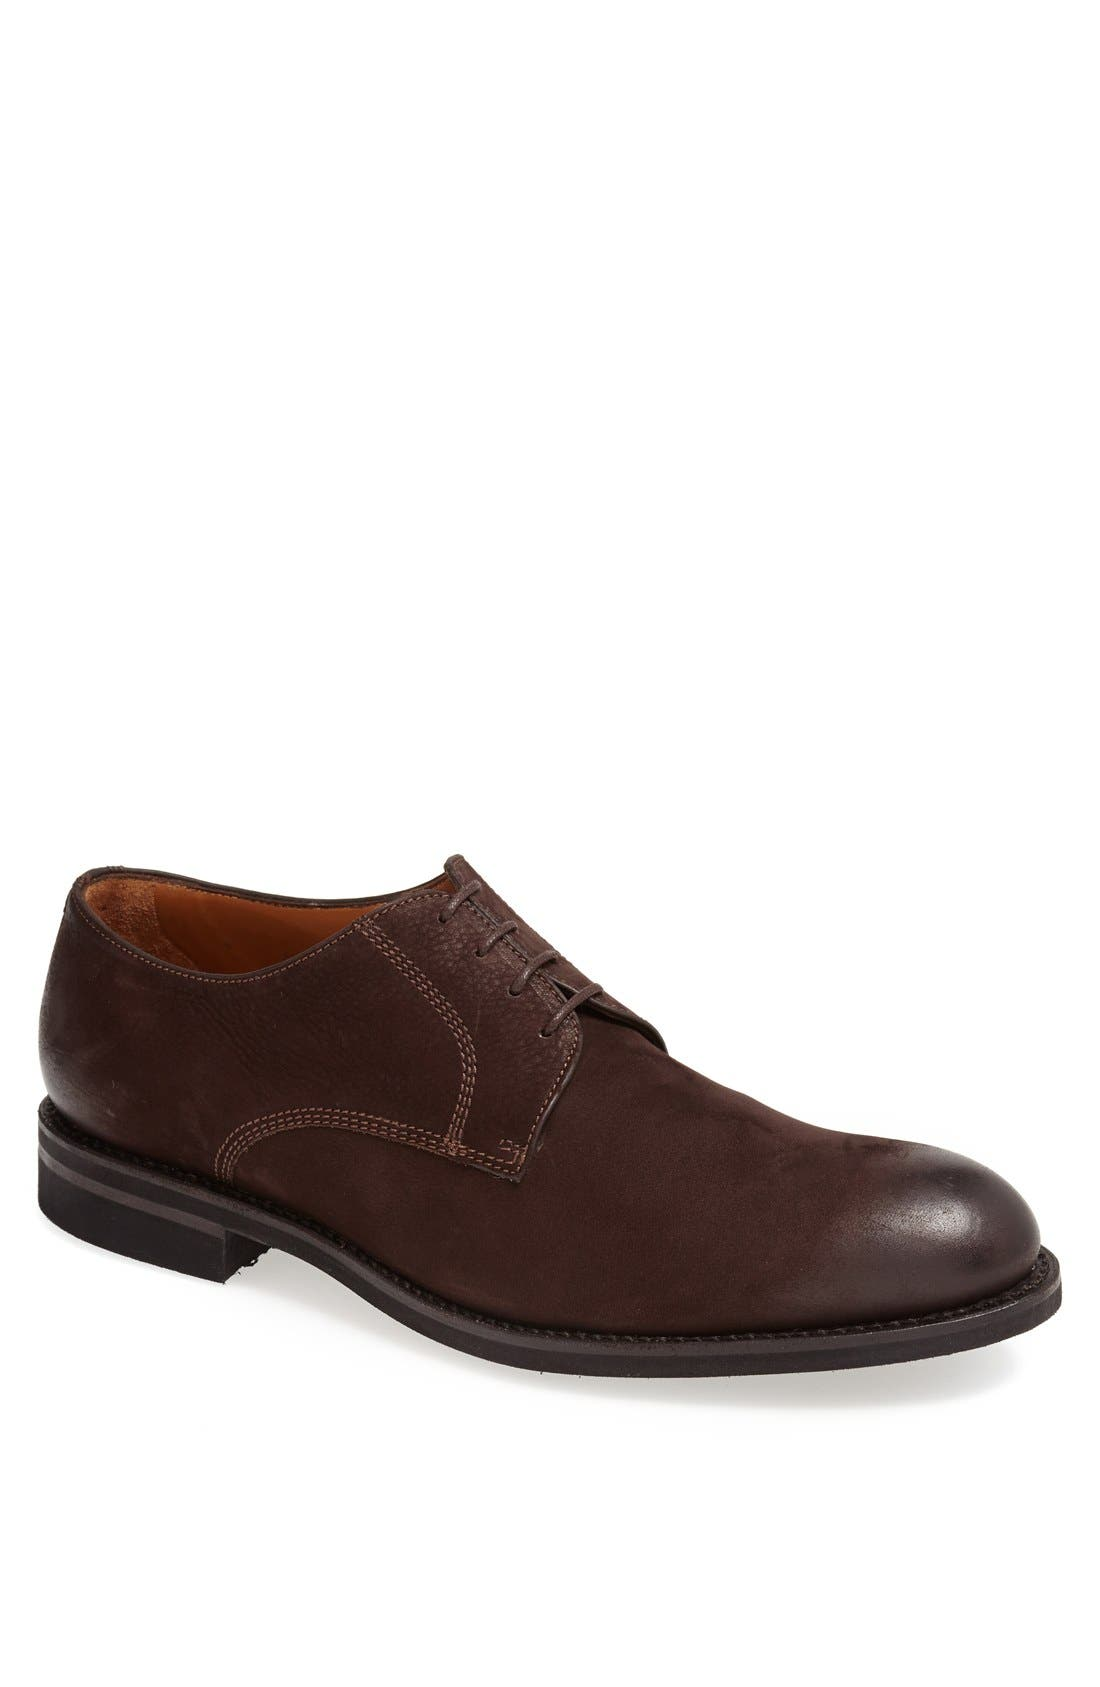 Main Image - Lottusse Leather Plain Toe Derby